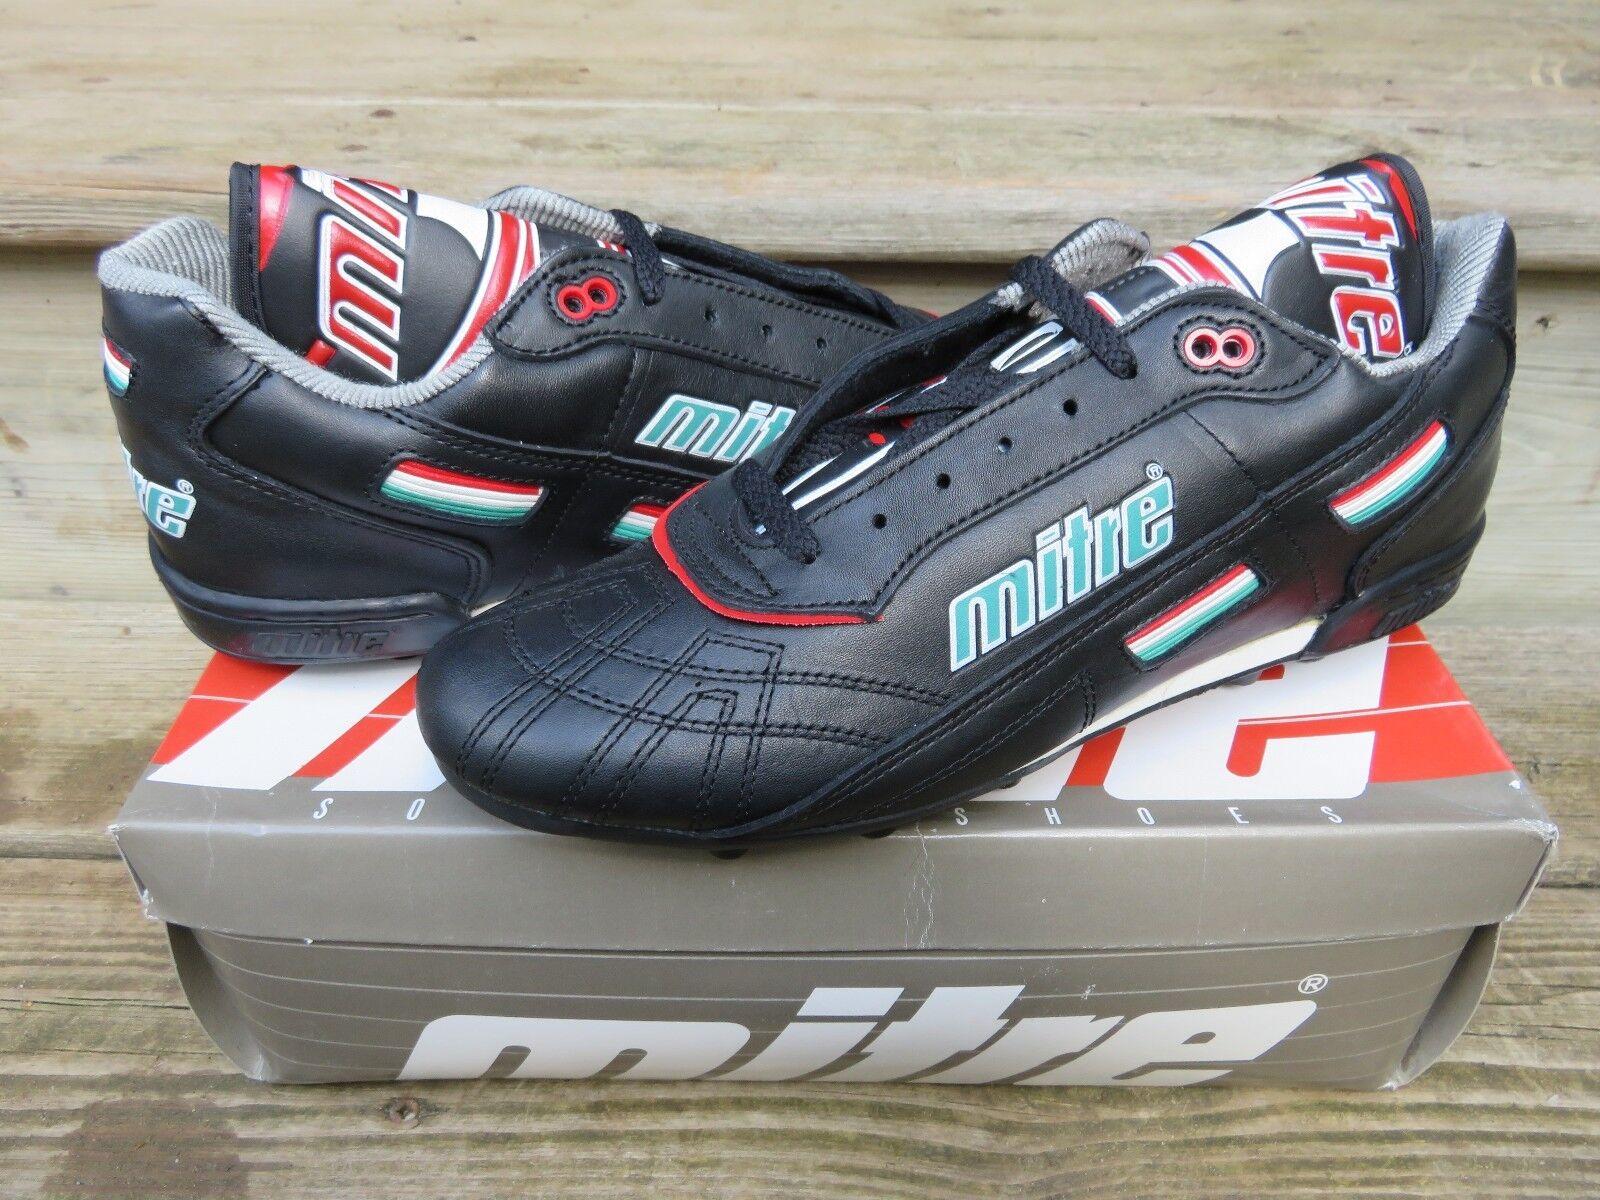 NOS Cleats Mitre Targa H.G. Soccer Größe 10 Athletic Outdoor Cleats NOS  Schuhes Vintage NEW 500c71